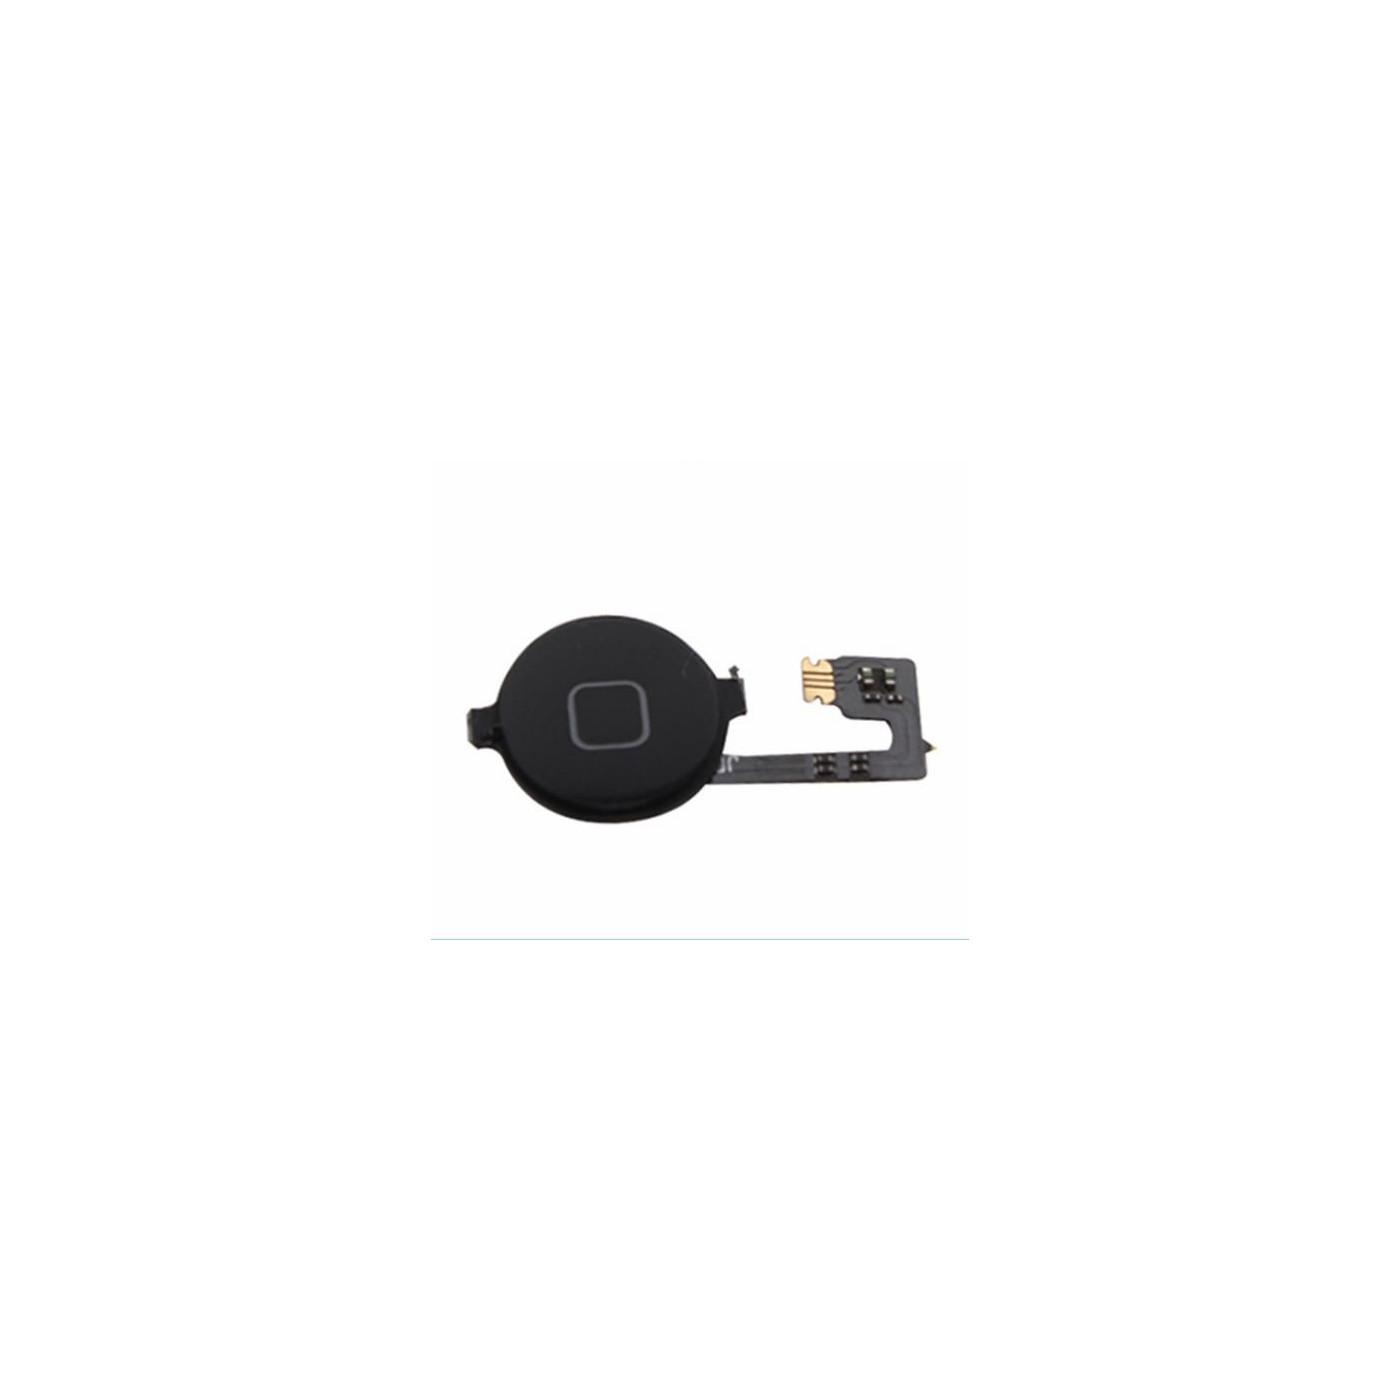 Inicio botón central slider flex plana para apple iphone 4 4g negro negro